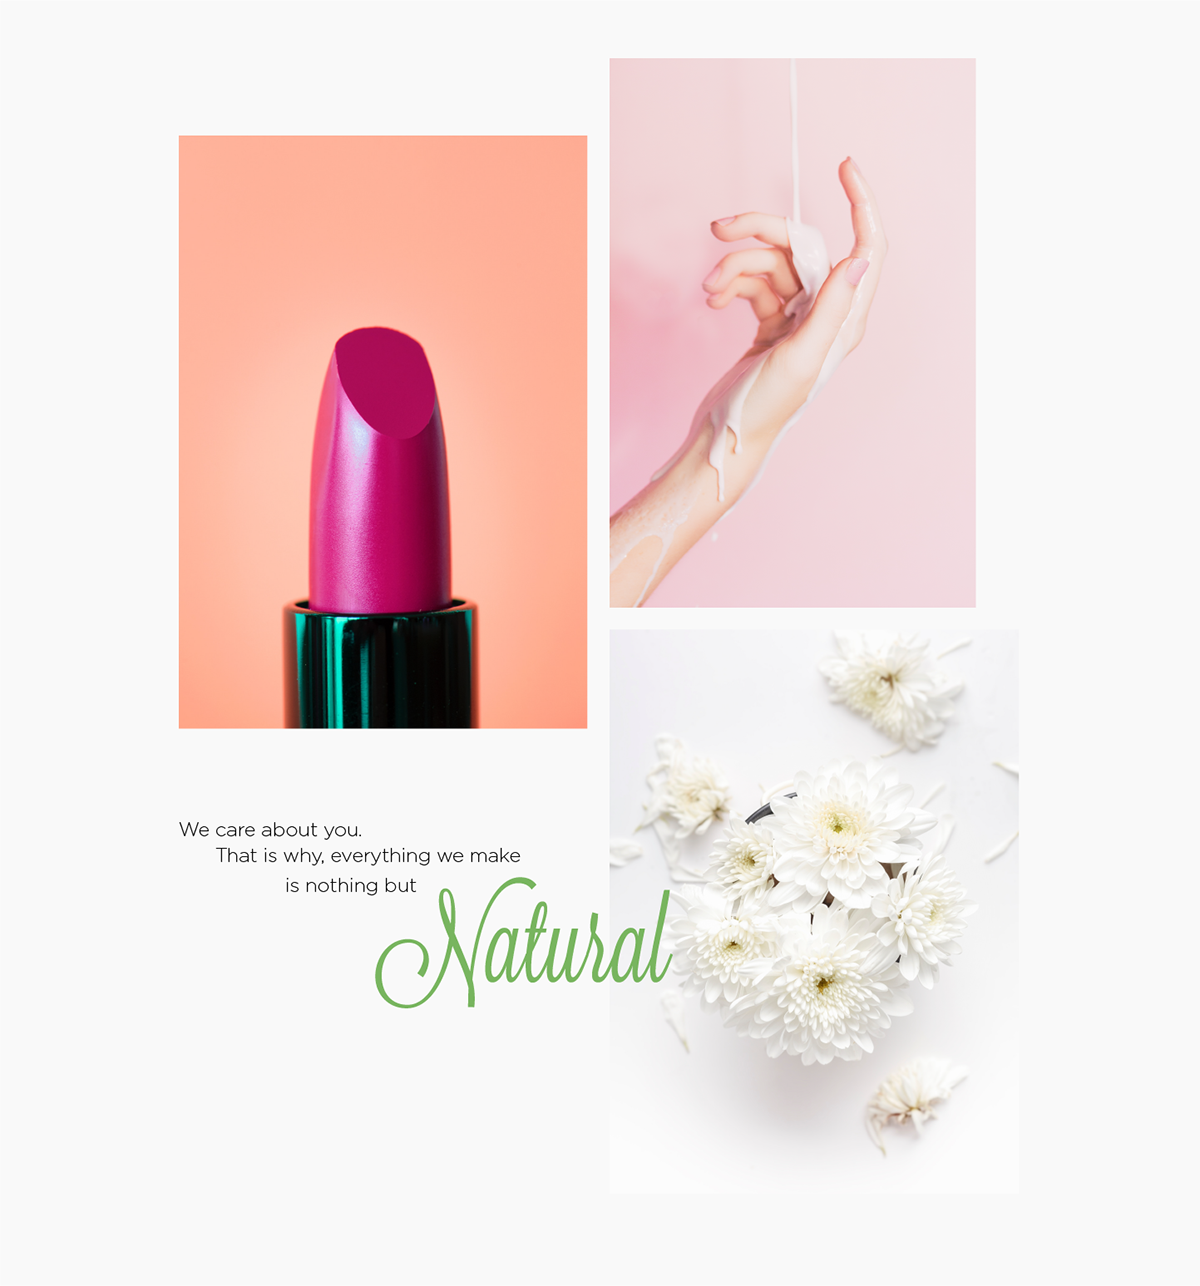 Fleur Cosmetics Beauty Brand Identity Design On Student Show